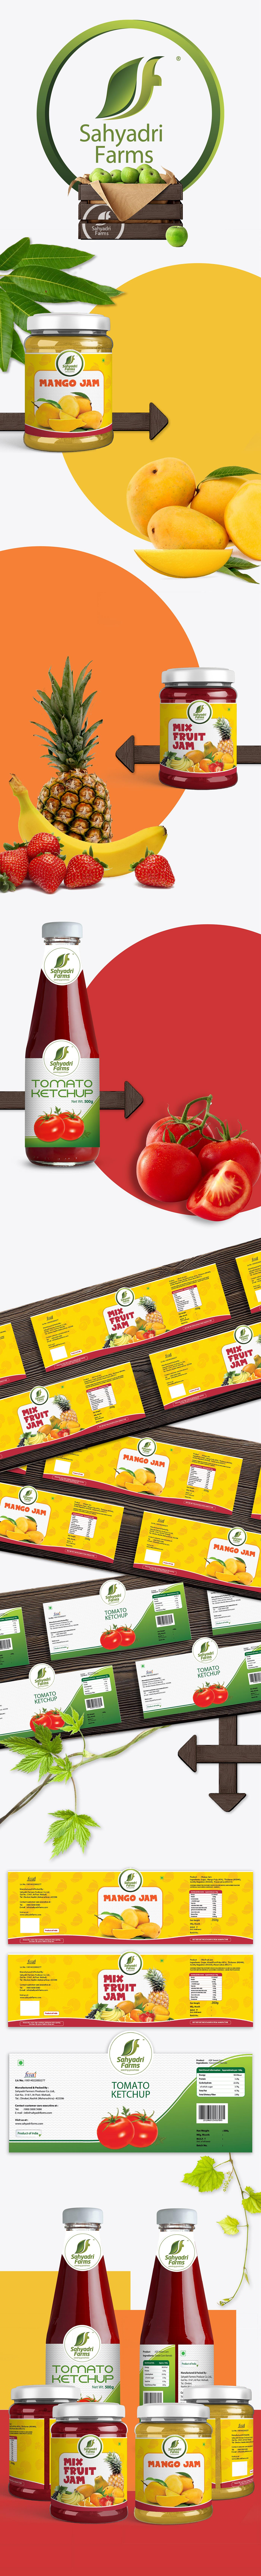 Startup Farms Sahyadri Farms fruit jam ketchup packaging design